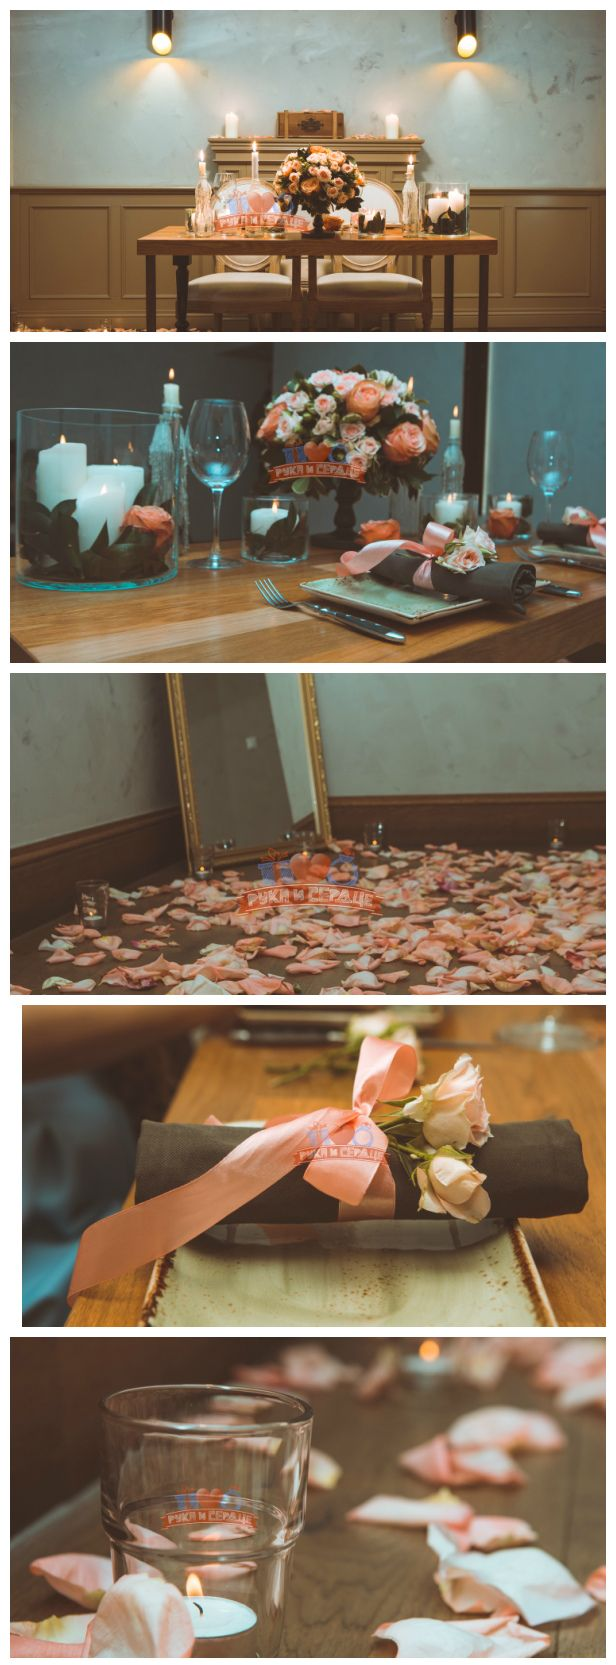 Свидание в ресторане. Ужин при свечах. Предложение руки и сердца/ Candlelight dinner. Romantic date. Romantic table decor. Proposal #rukaiserdce #рукаисердце #свидание #предложение #date #proposal #engagement #surprise #romantic